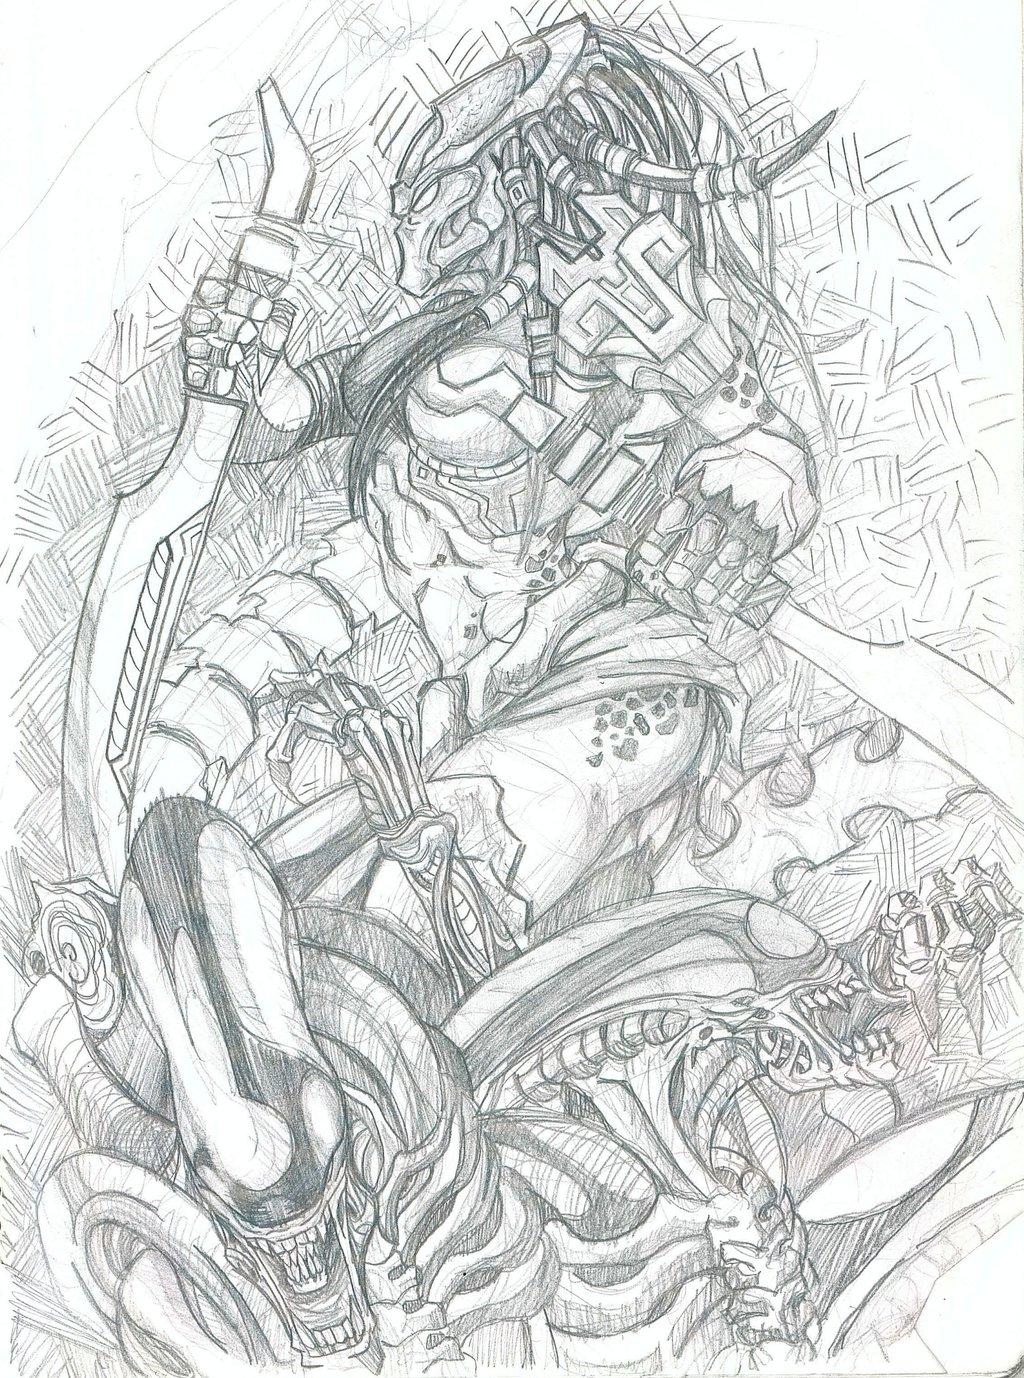 Drawn warrior yautja Female DeviantArt by Yautja fovick